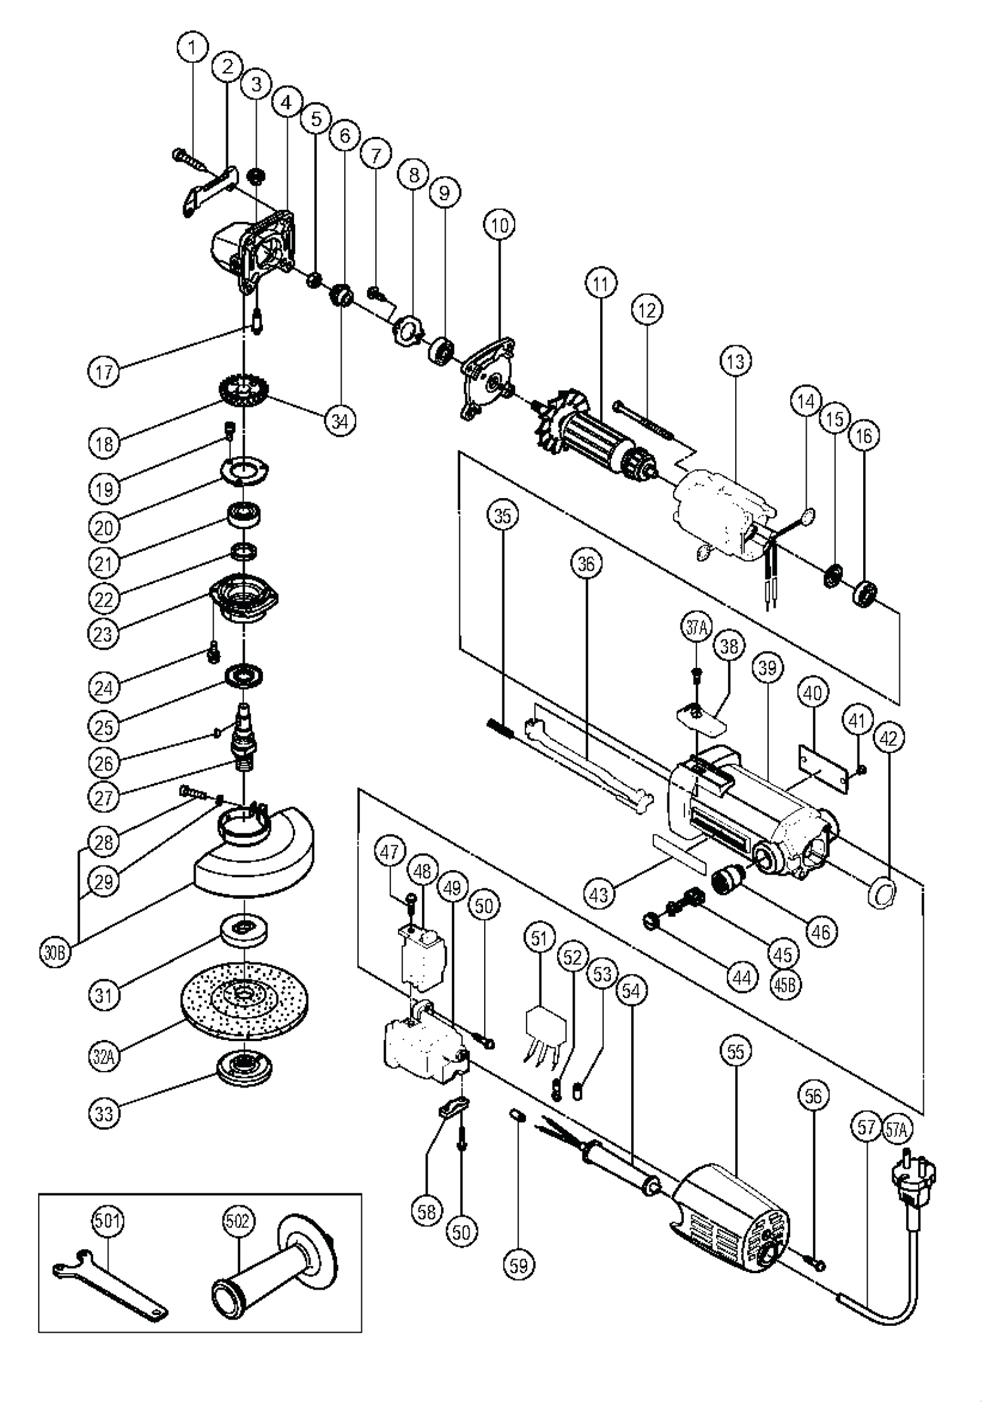 Hitachi fg12sa2 parts schematic